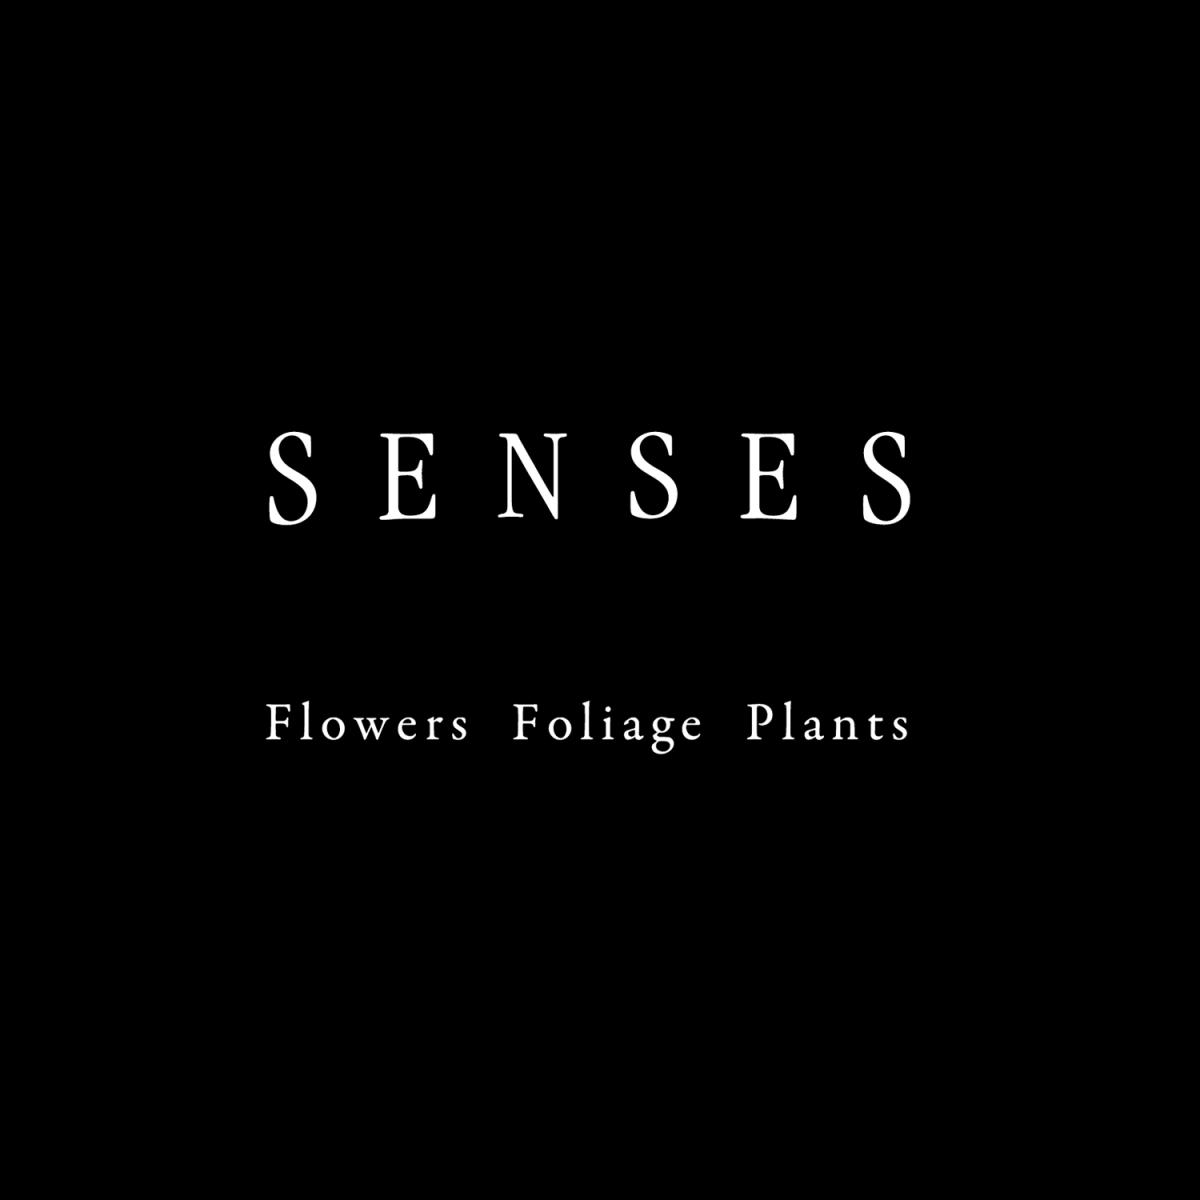 studio SENSES|フラワースタジオ|ロゴデザイン グラフィックデザイン|東京都世田谷